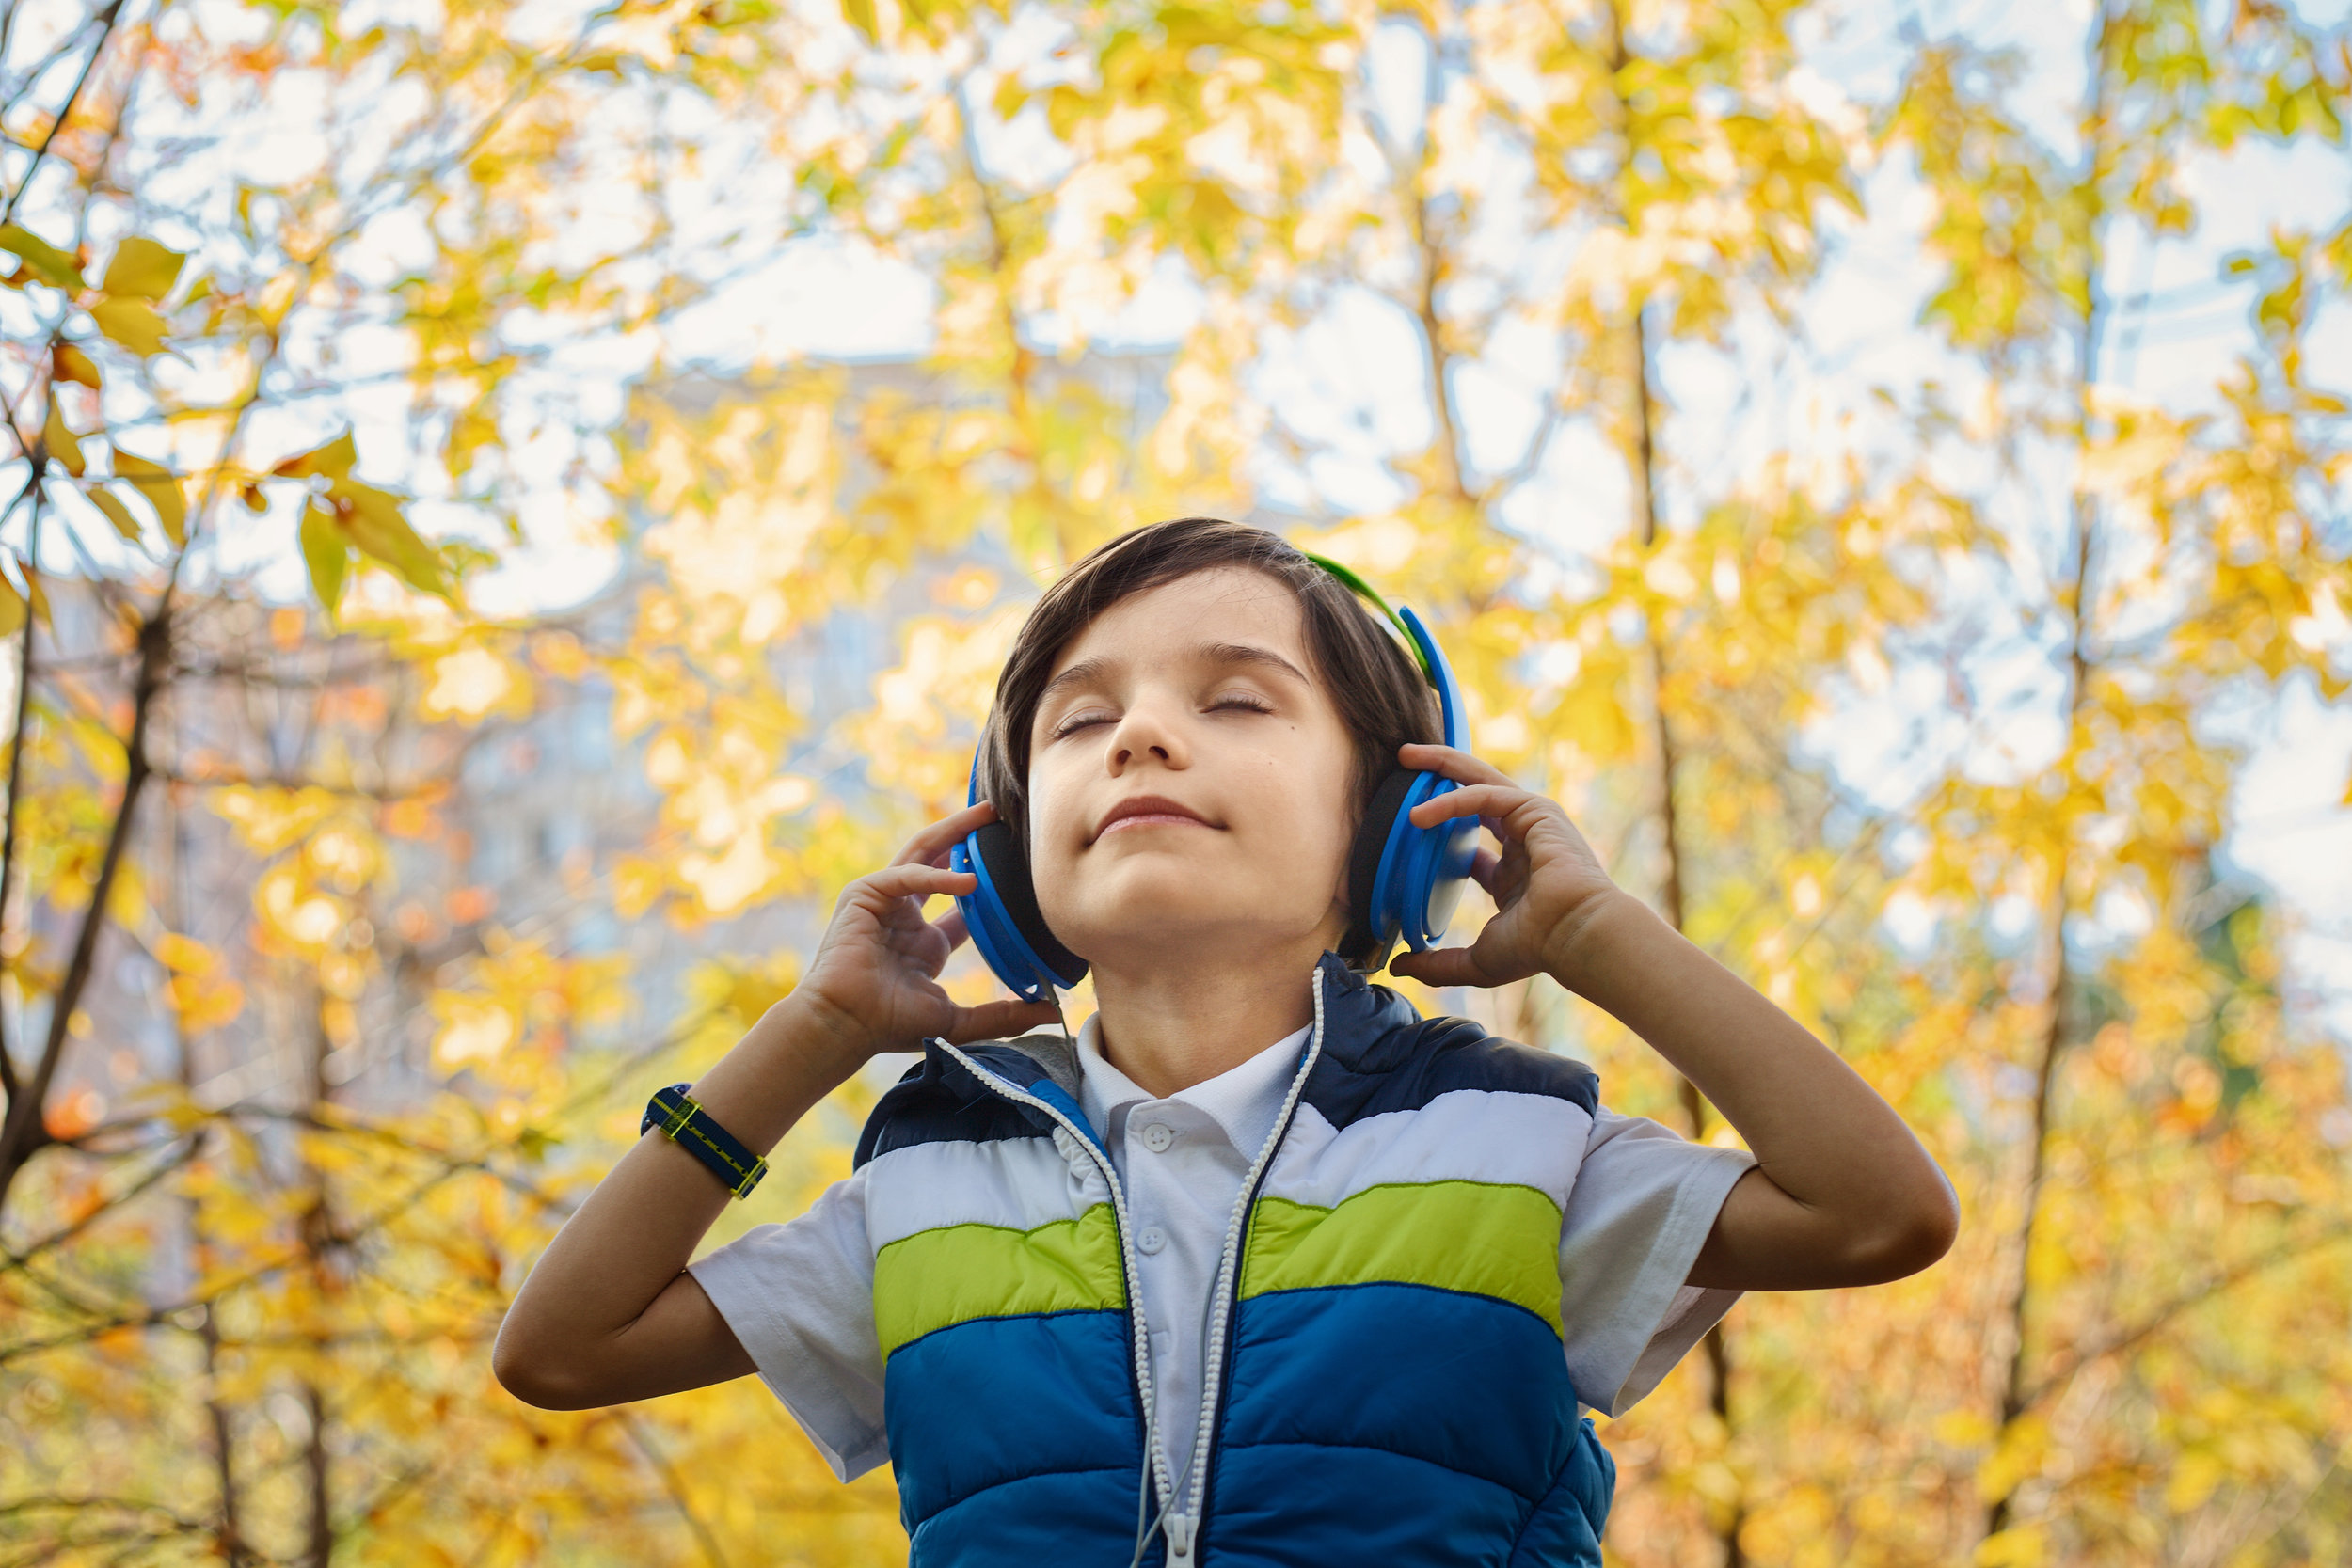 Canva - Photo of a Boy Listening in Headphones.jpg